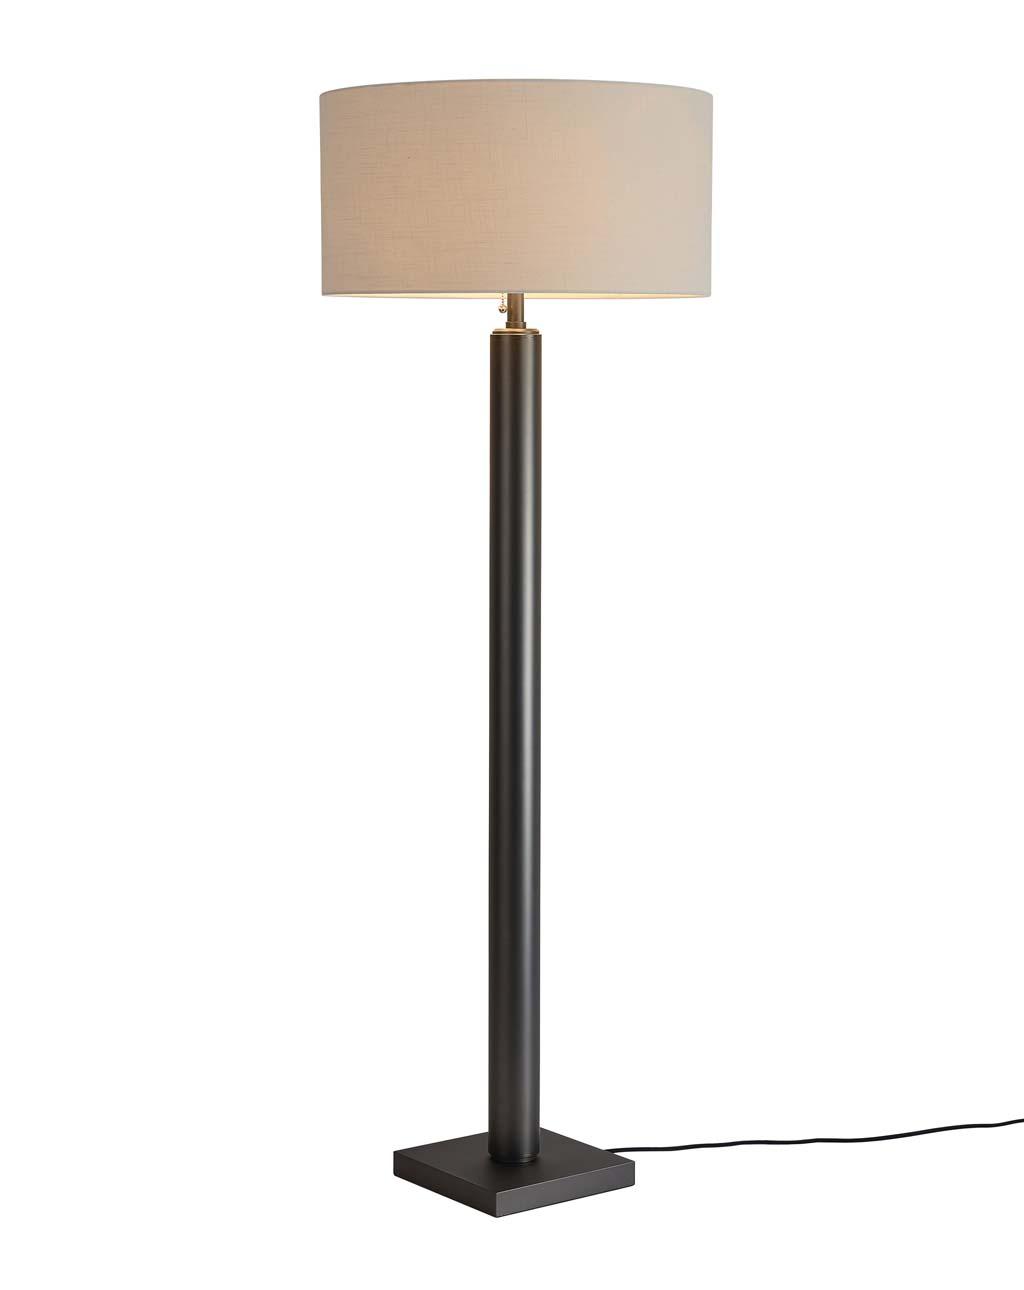 Brentwood Metal Column Floor Lamp, Gunmetal